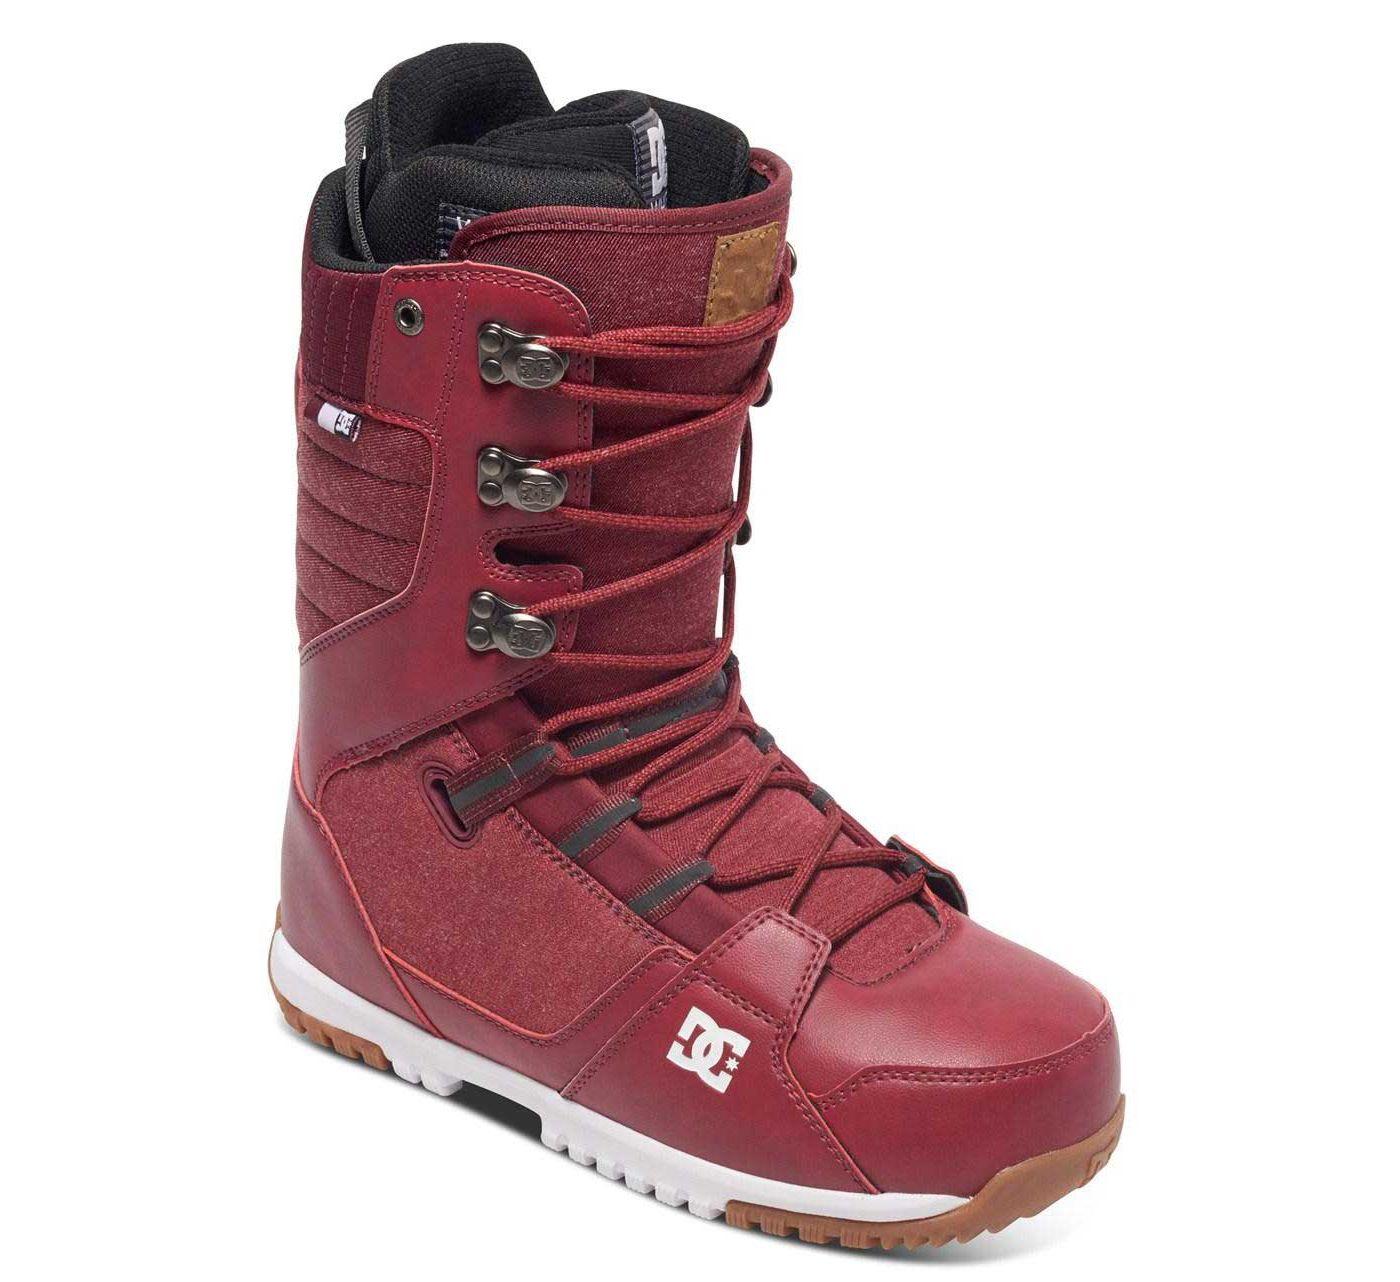 DC Shoes Men's Mutiny 2016-2017 Snowboard Boots